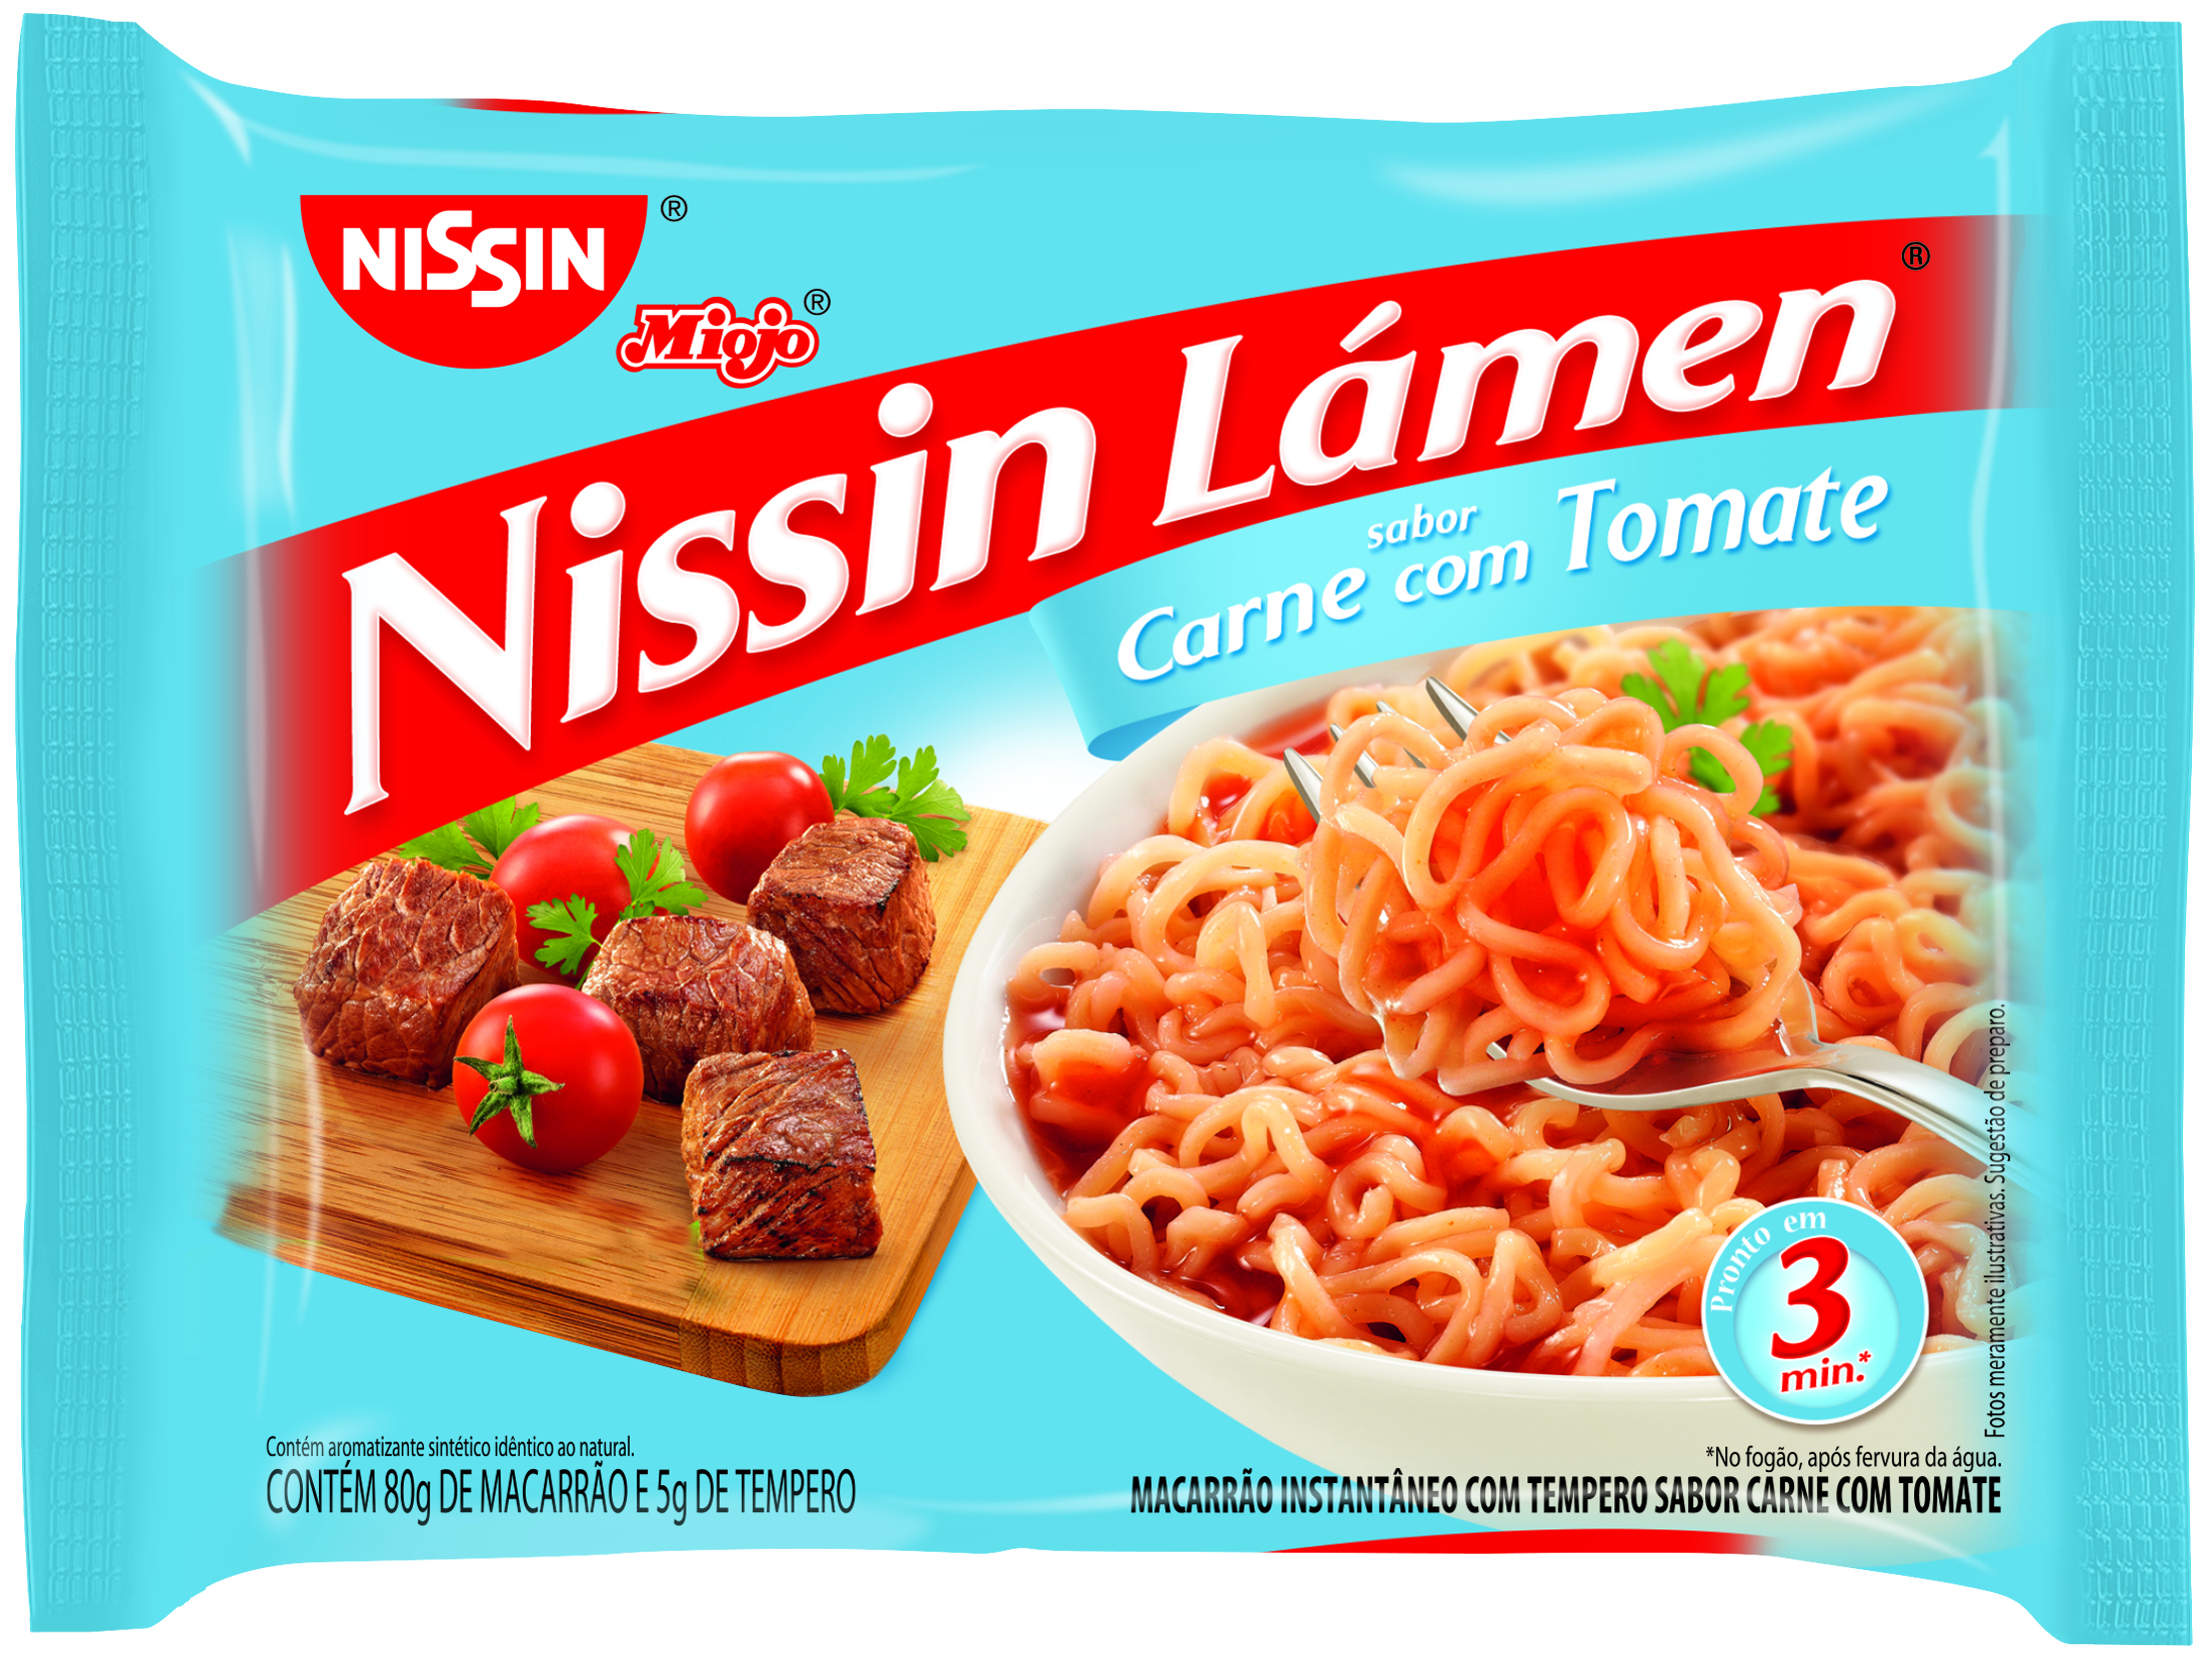 NISSIN LAMEN CARNE C/TOMATE 1X85G (50)